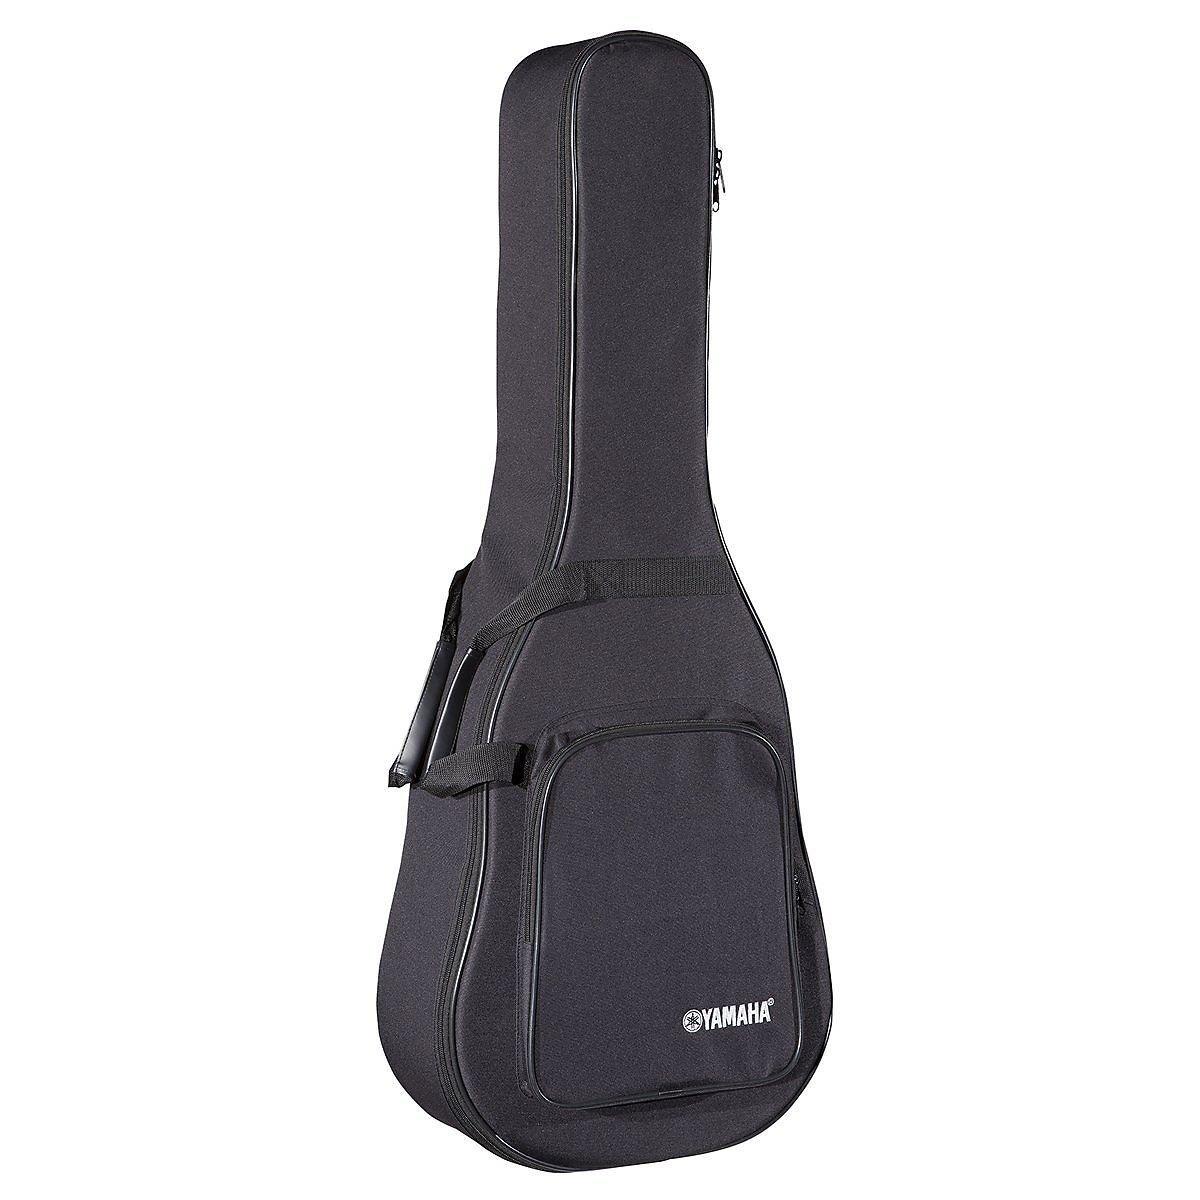 Yamaha CG soft case